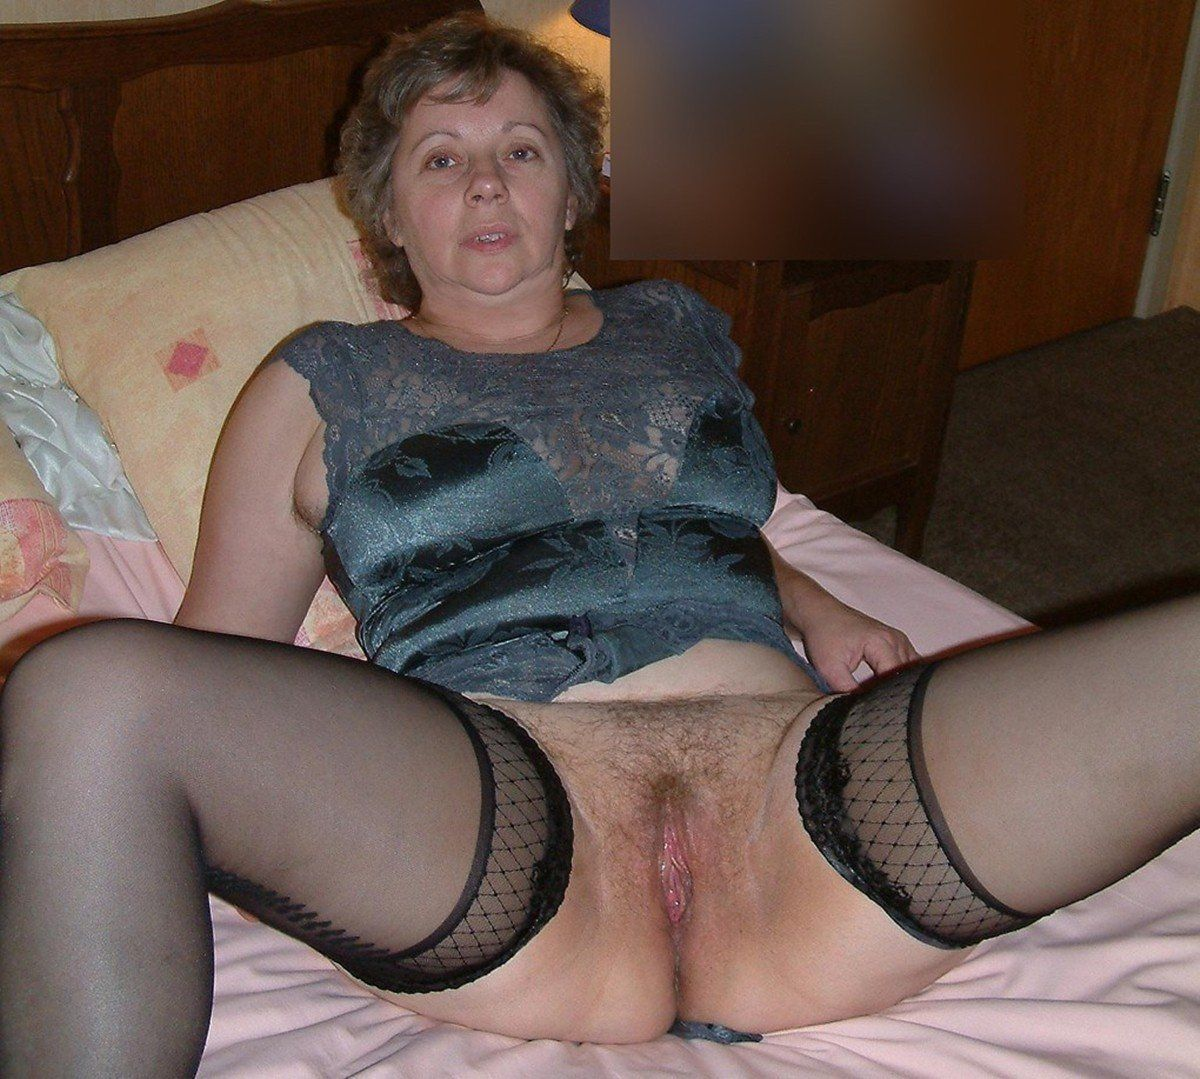 Amateur Mature Porn Gallery mature amateur panty thumbs - hot naked pics. comments: 2